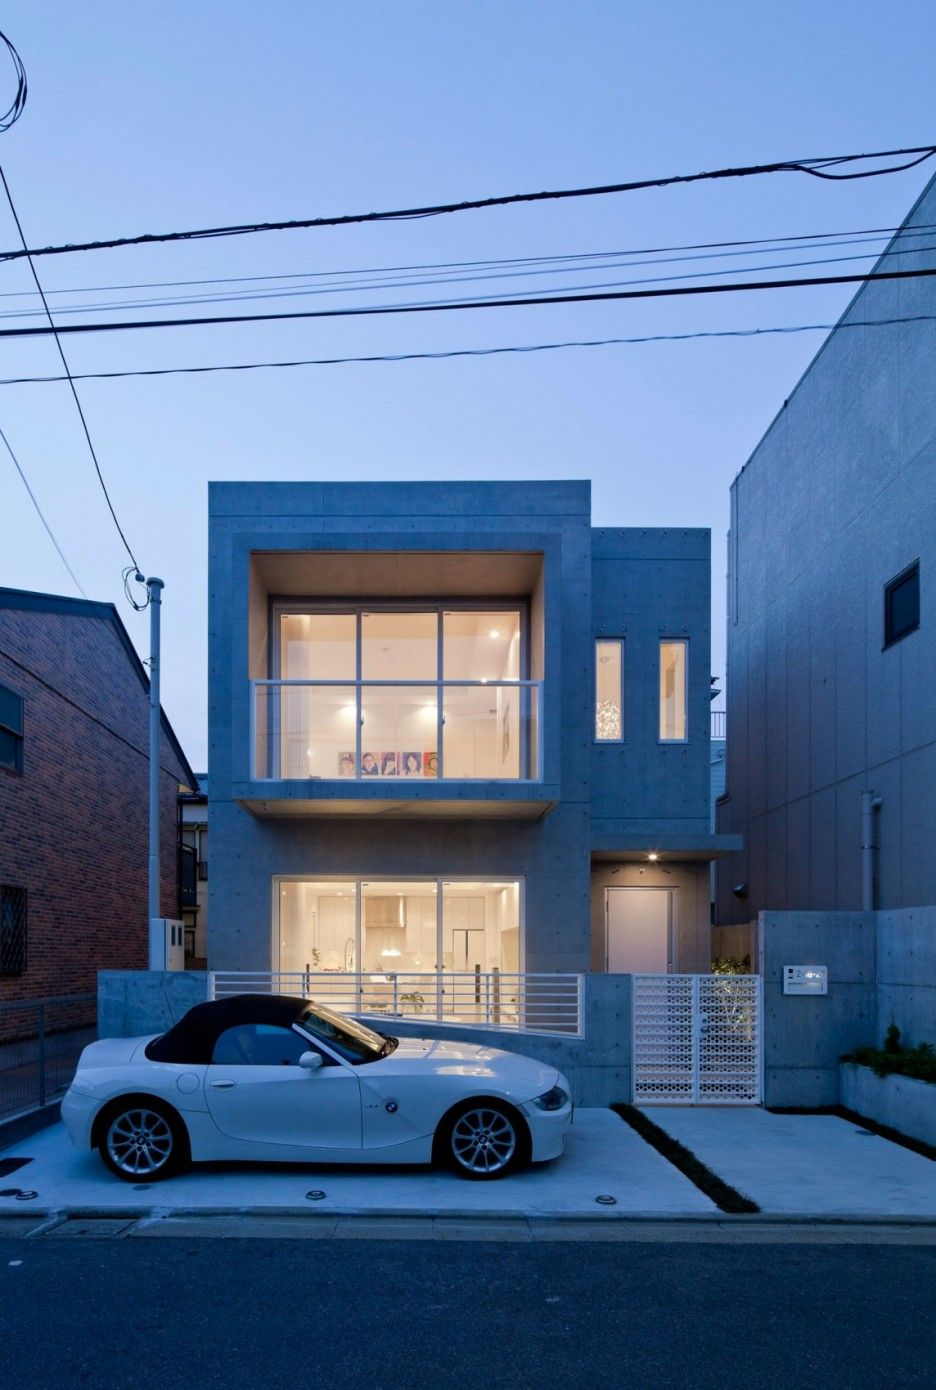 Stunning Modern Design House Decorated Clean Interior: Small Concrete House Modern Zen Design